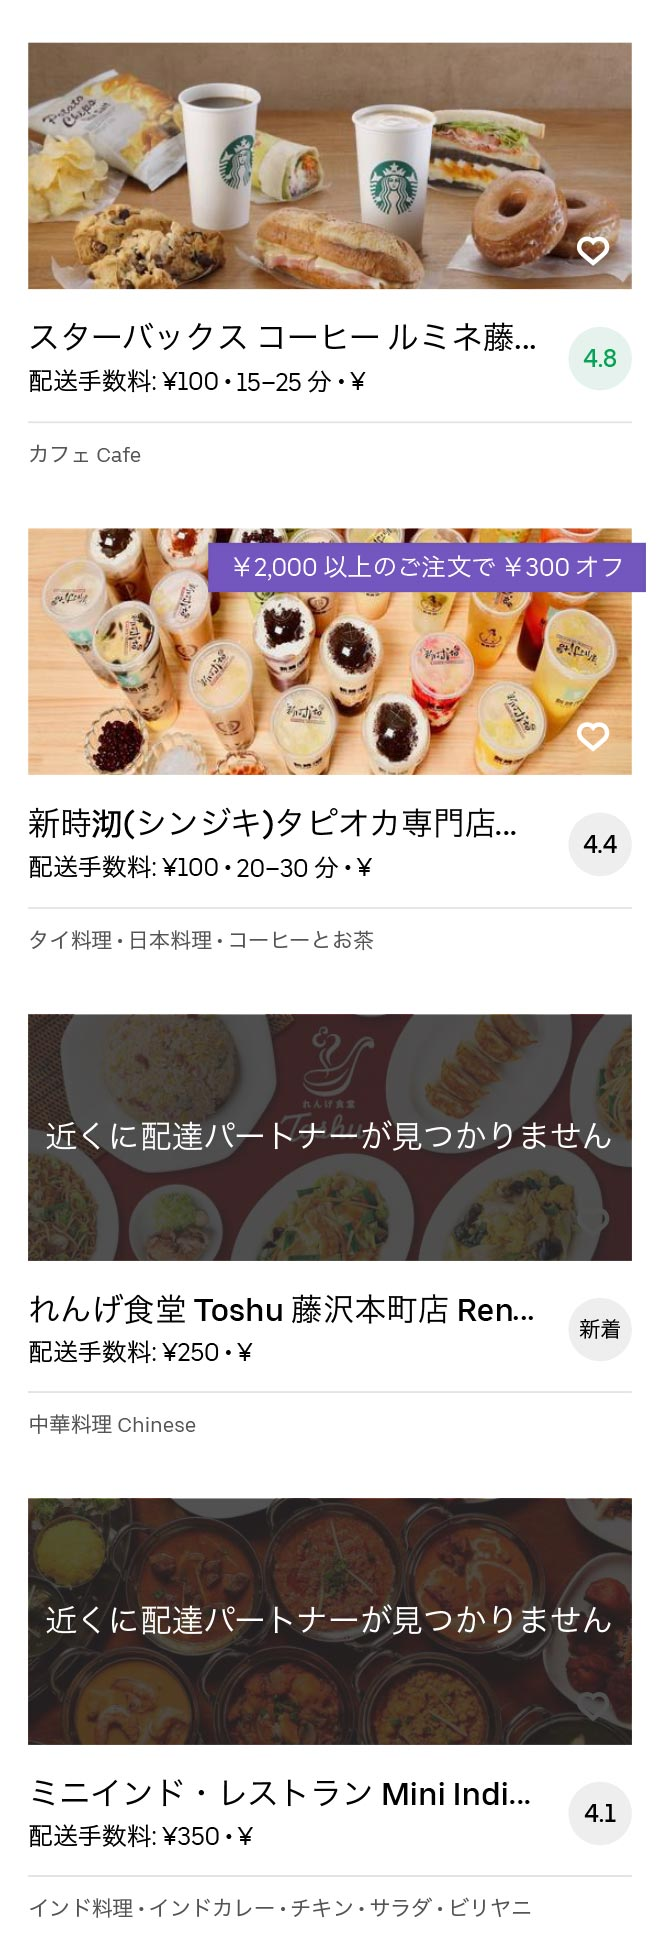 Fujisawa menu 2008 05